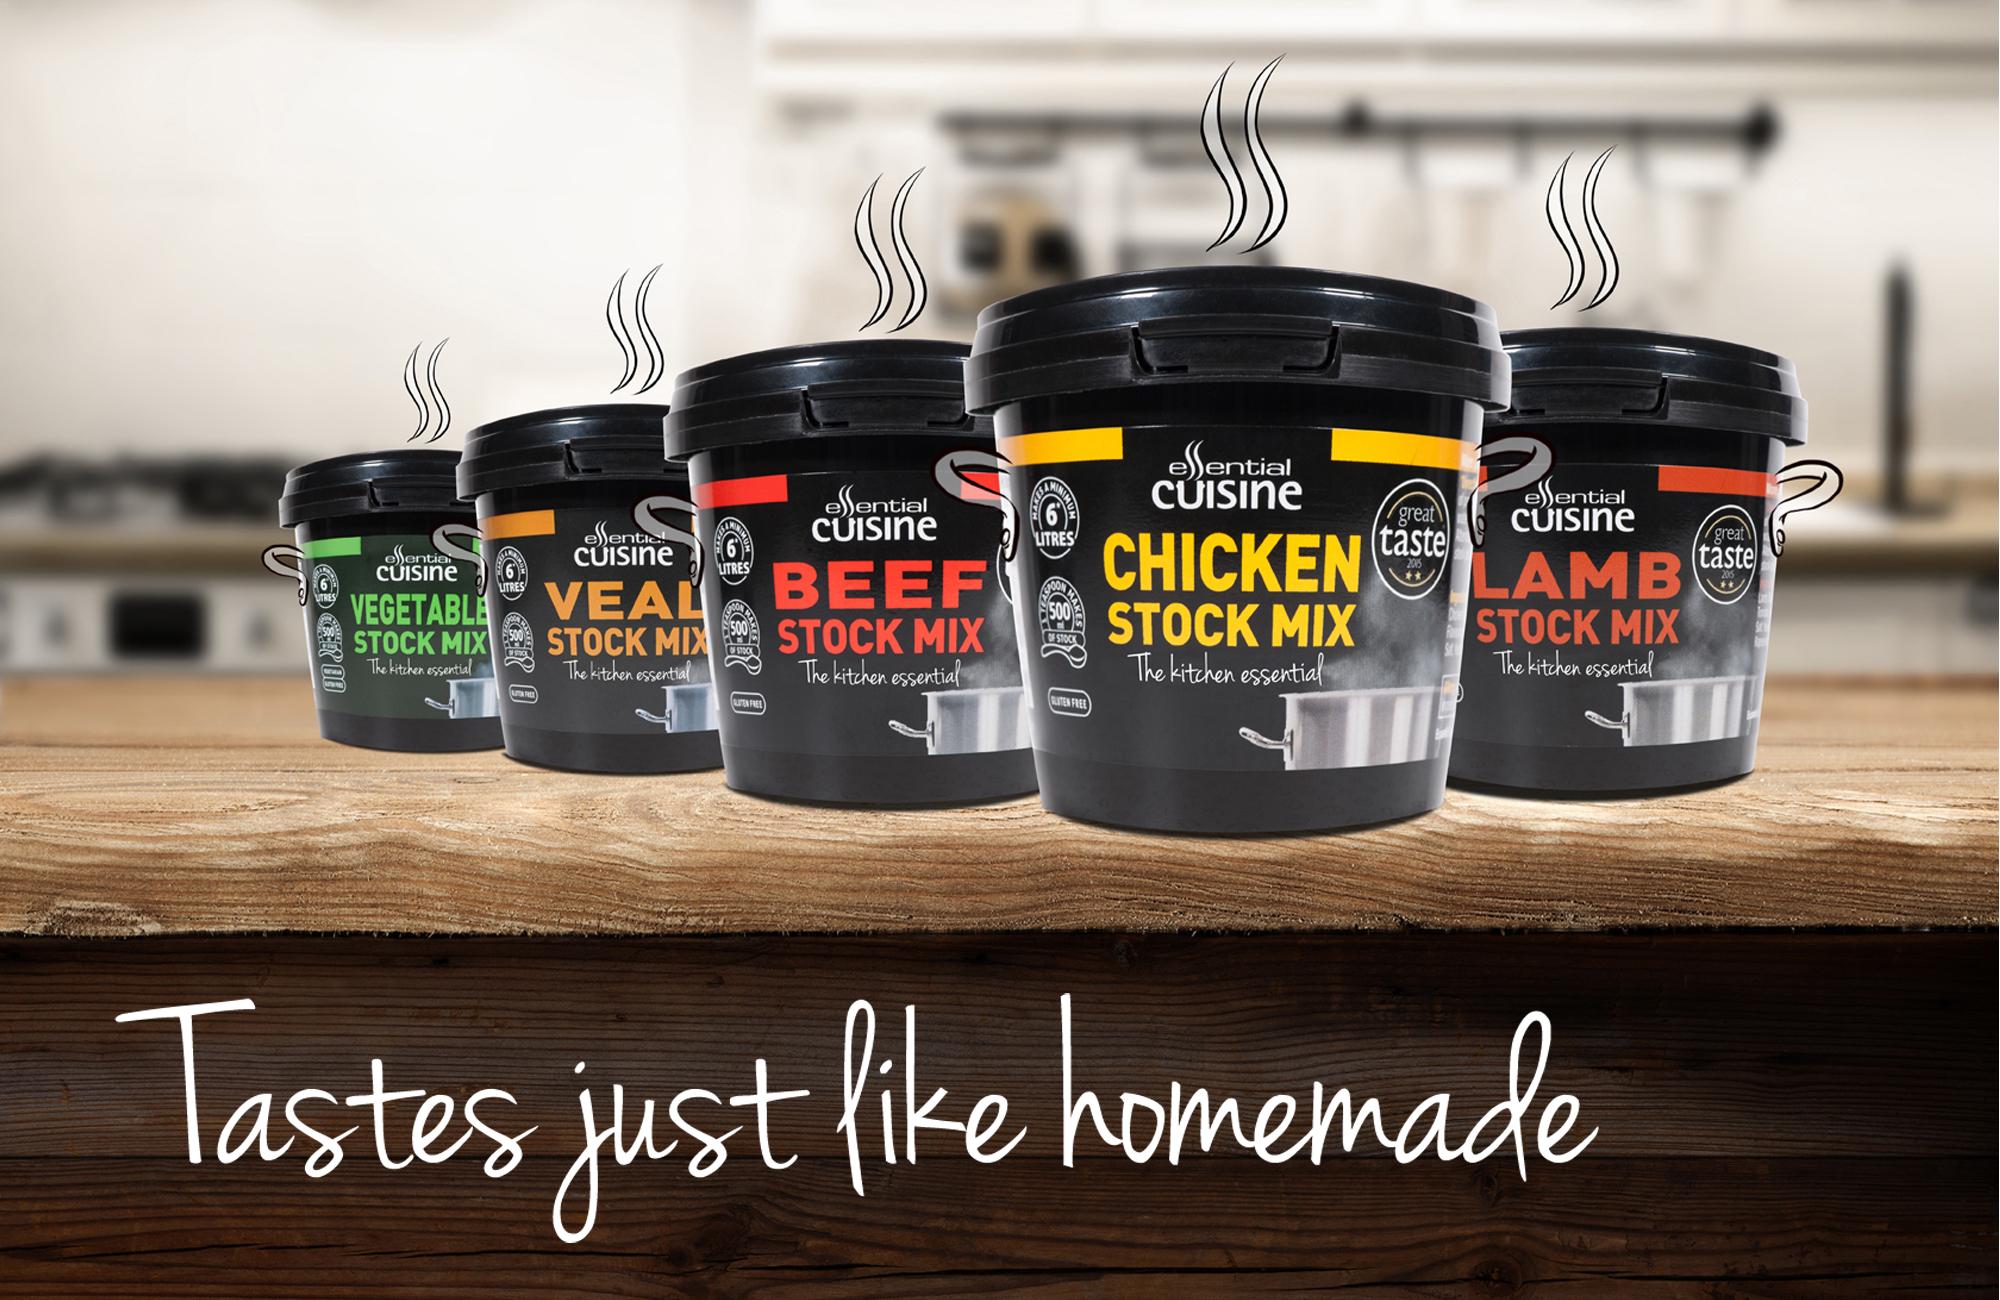 Retail Packaging Design for Essential Cuisine